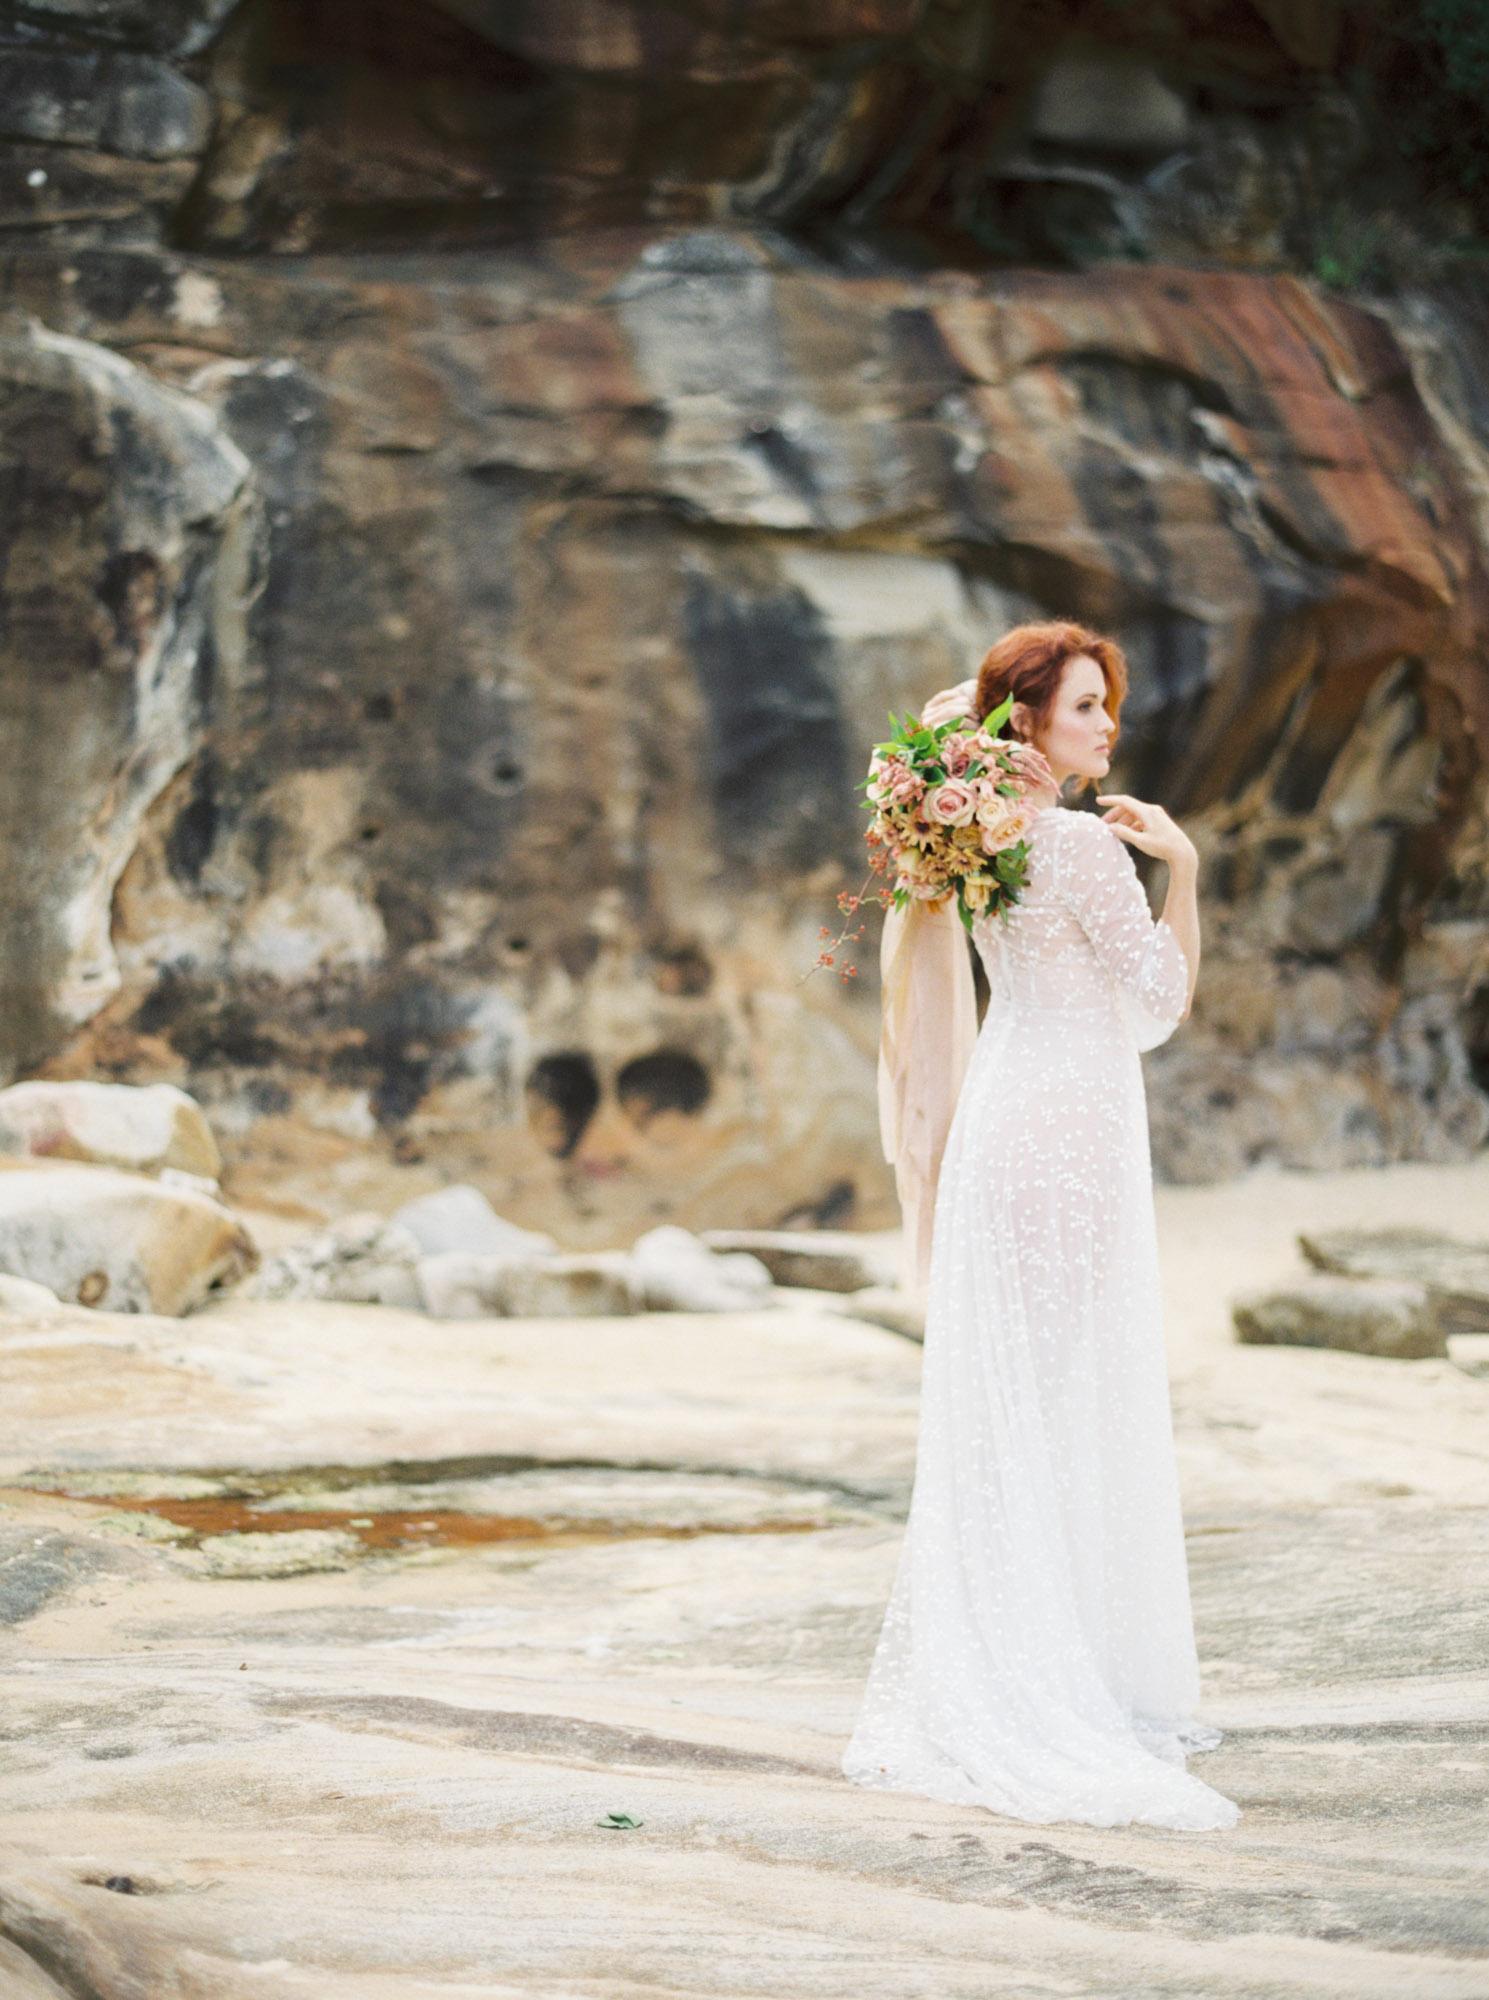 00036- Fine Art Film Newcastle NSW Wedding Photographer Sheri McMahon.jpg